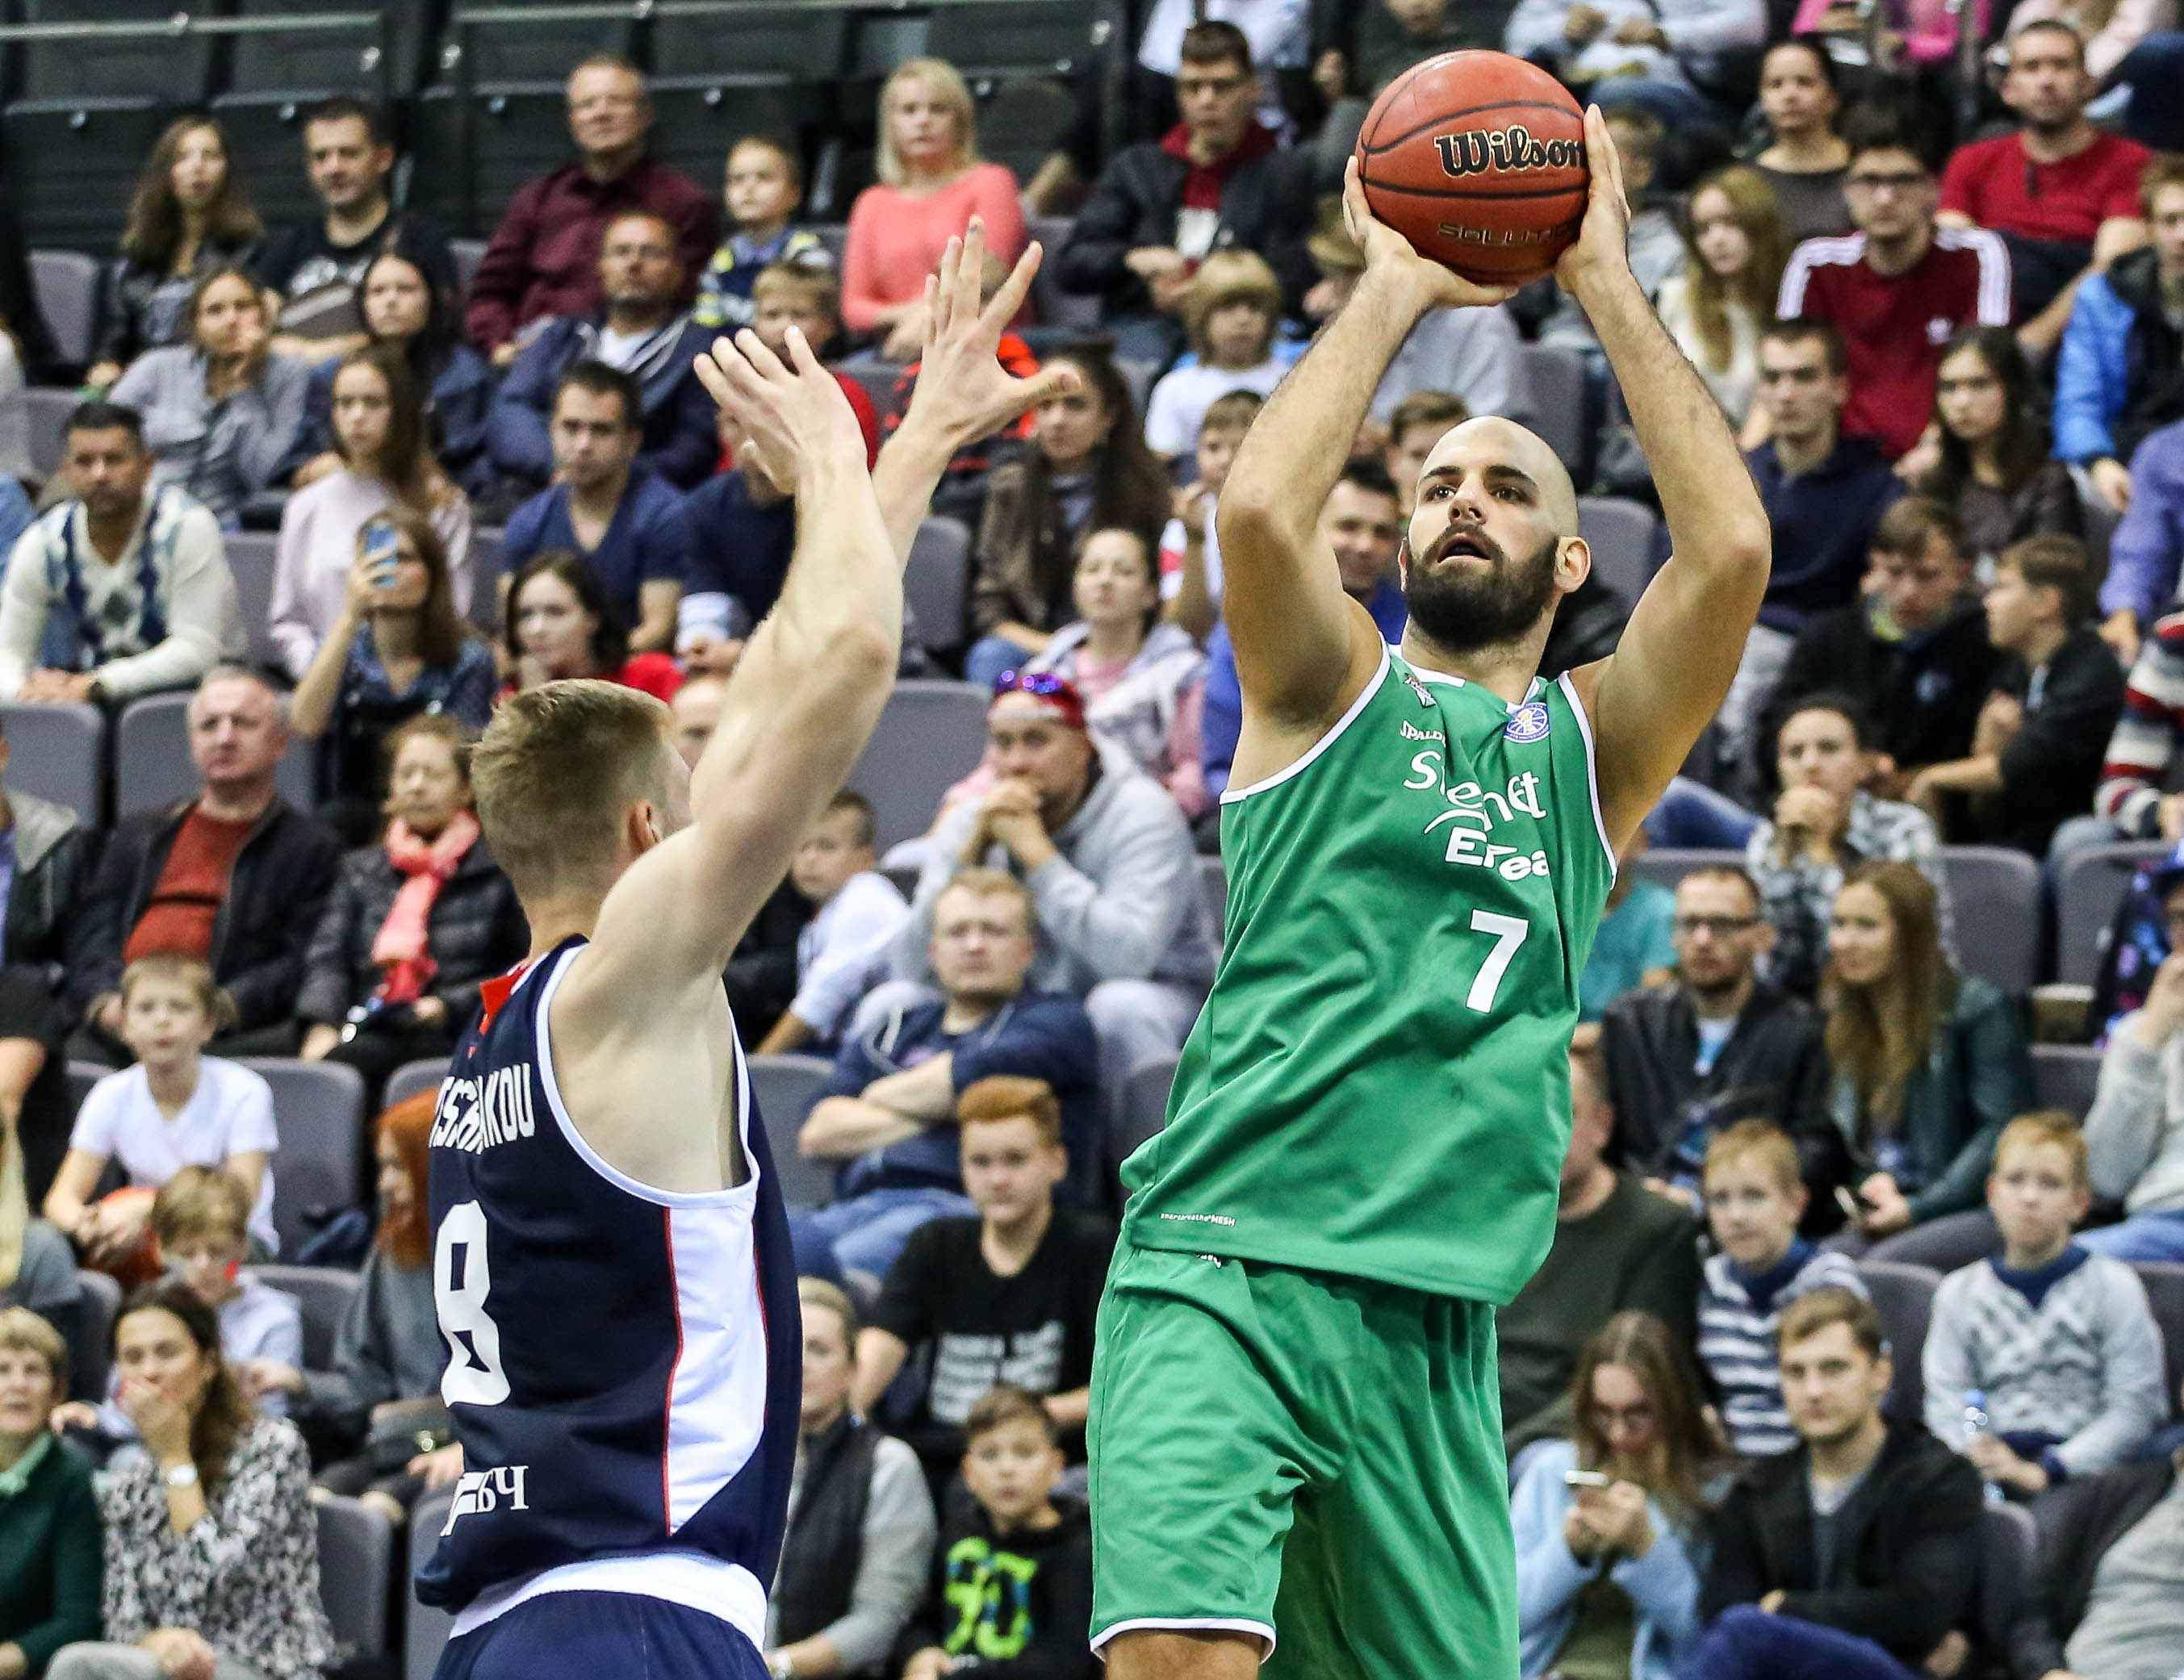 Zielona Gora Wins VTB League Debut